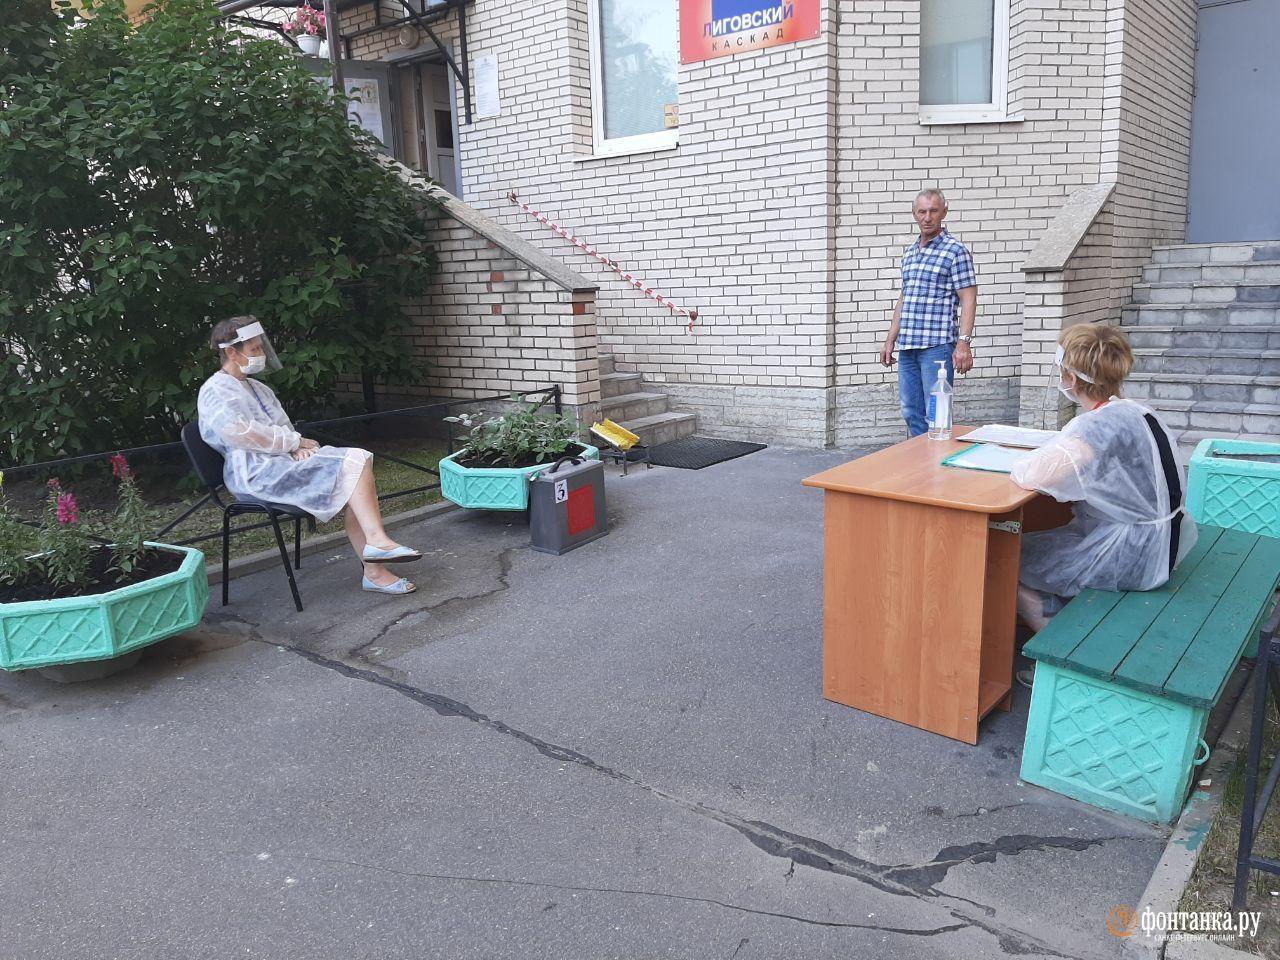 УИК 1160<br><br>Автор фото Ирина Корбат / «Фонтанка.ру»<br>